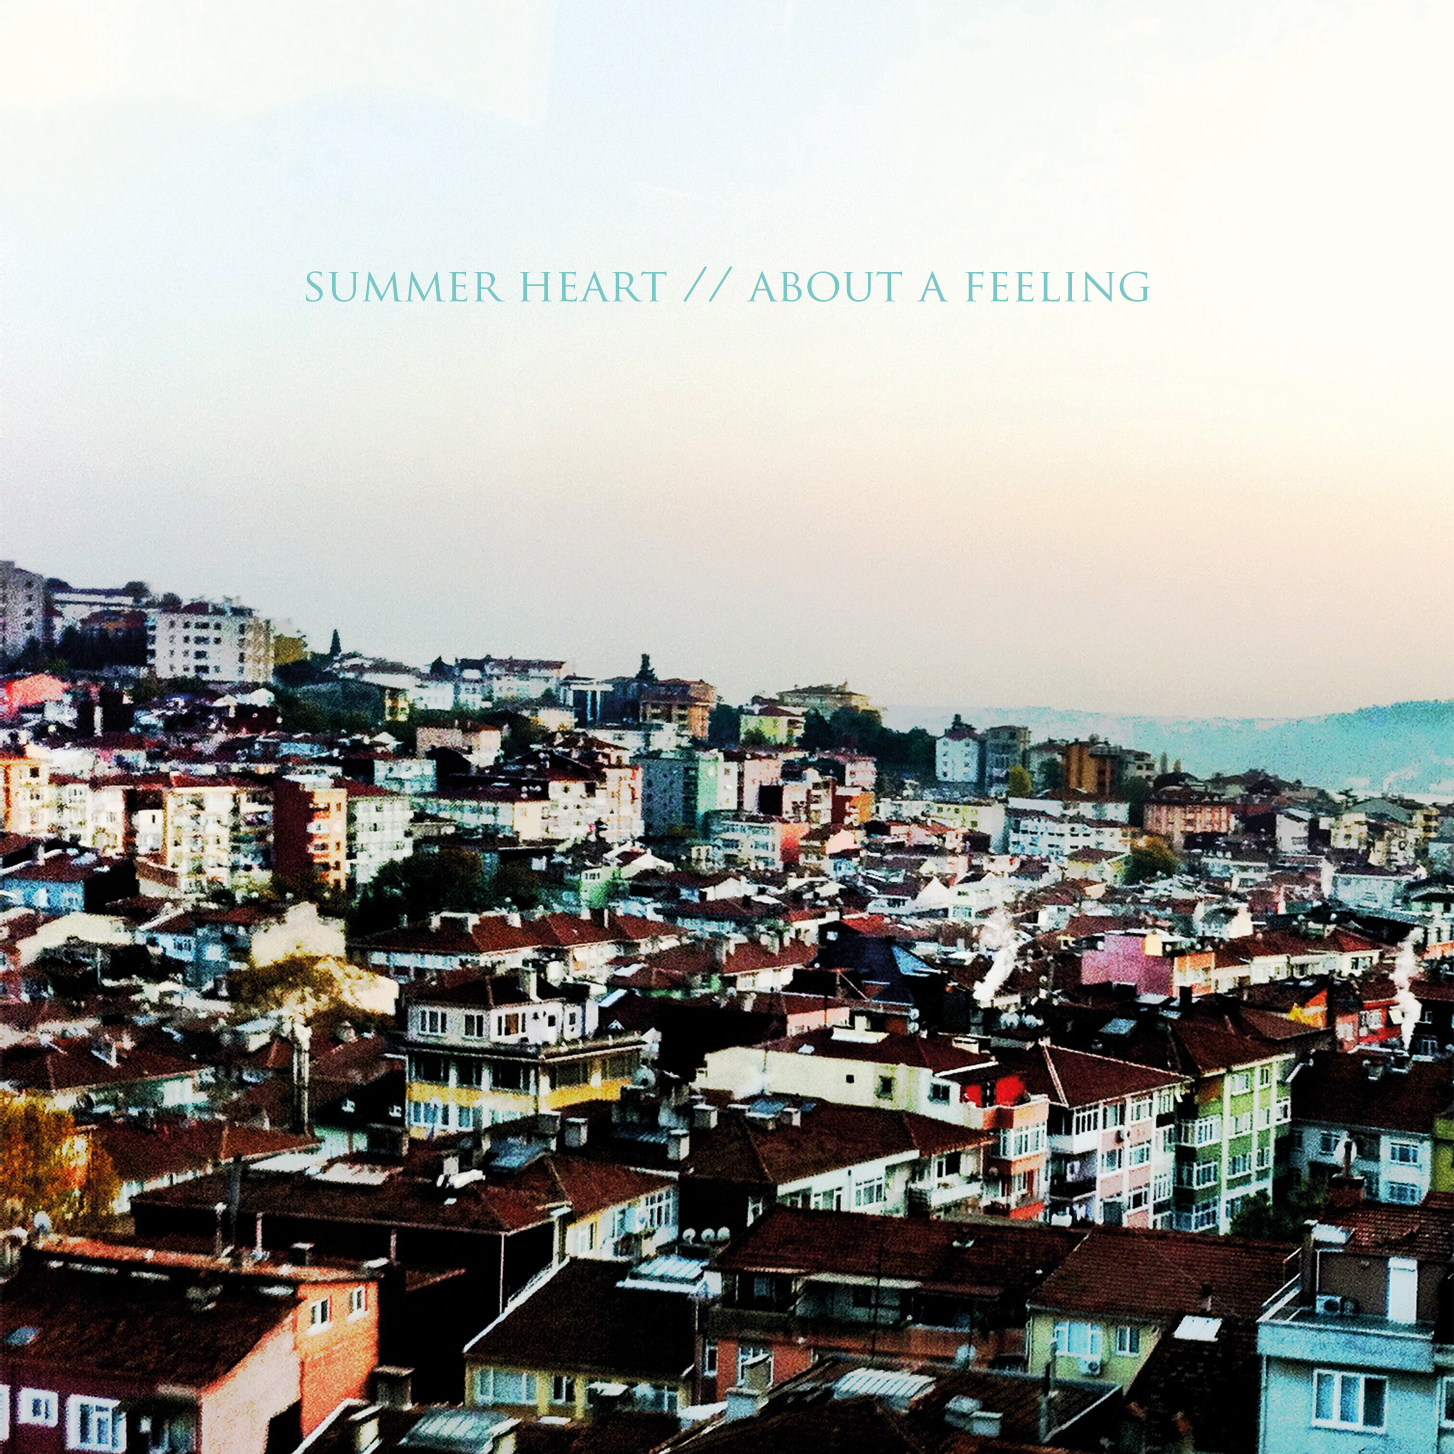 Summer Heart - About a Feeling